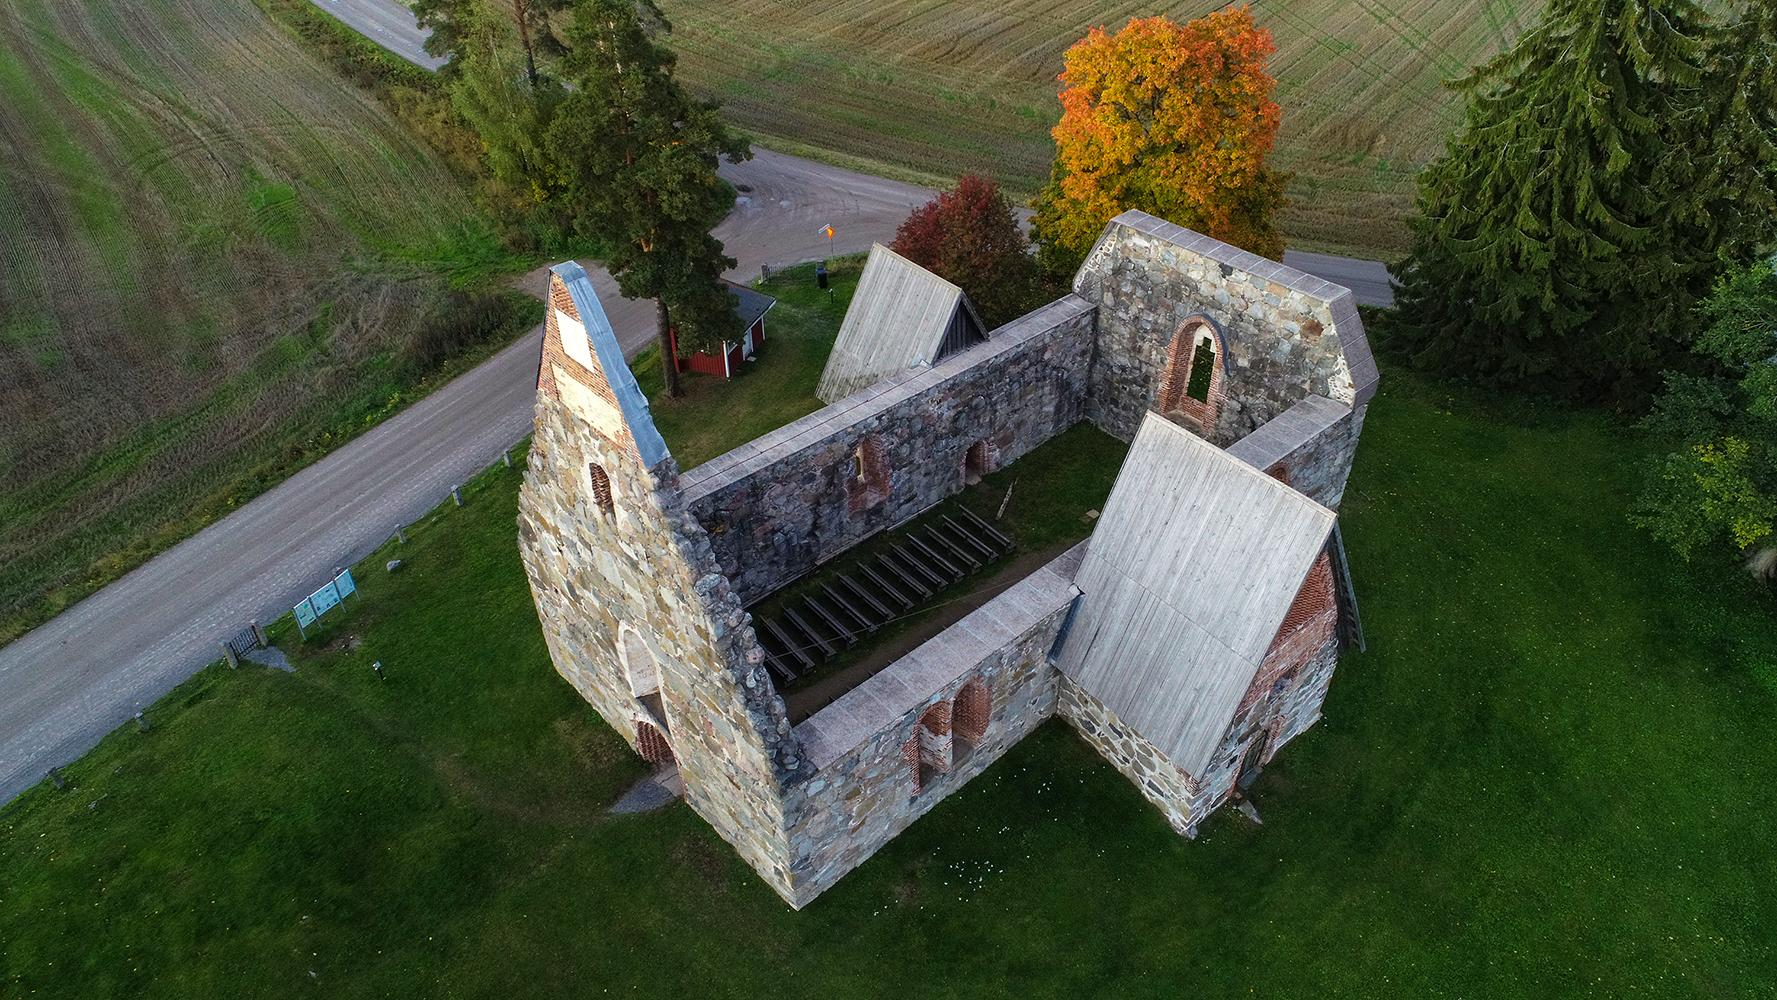 Valokuvaaja Timo Ahola - Drone-ilmakuvaus - Pälkäneen kivikirkko - Pälkäne (c) Valokuvaaja Timo Ahola